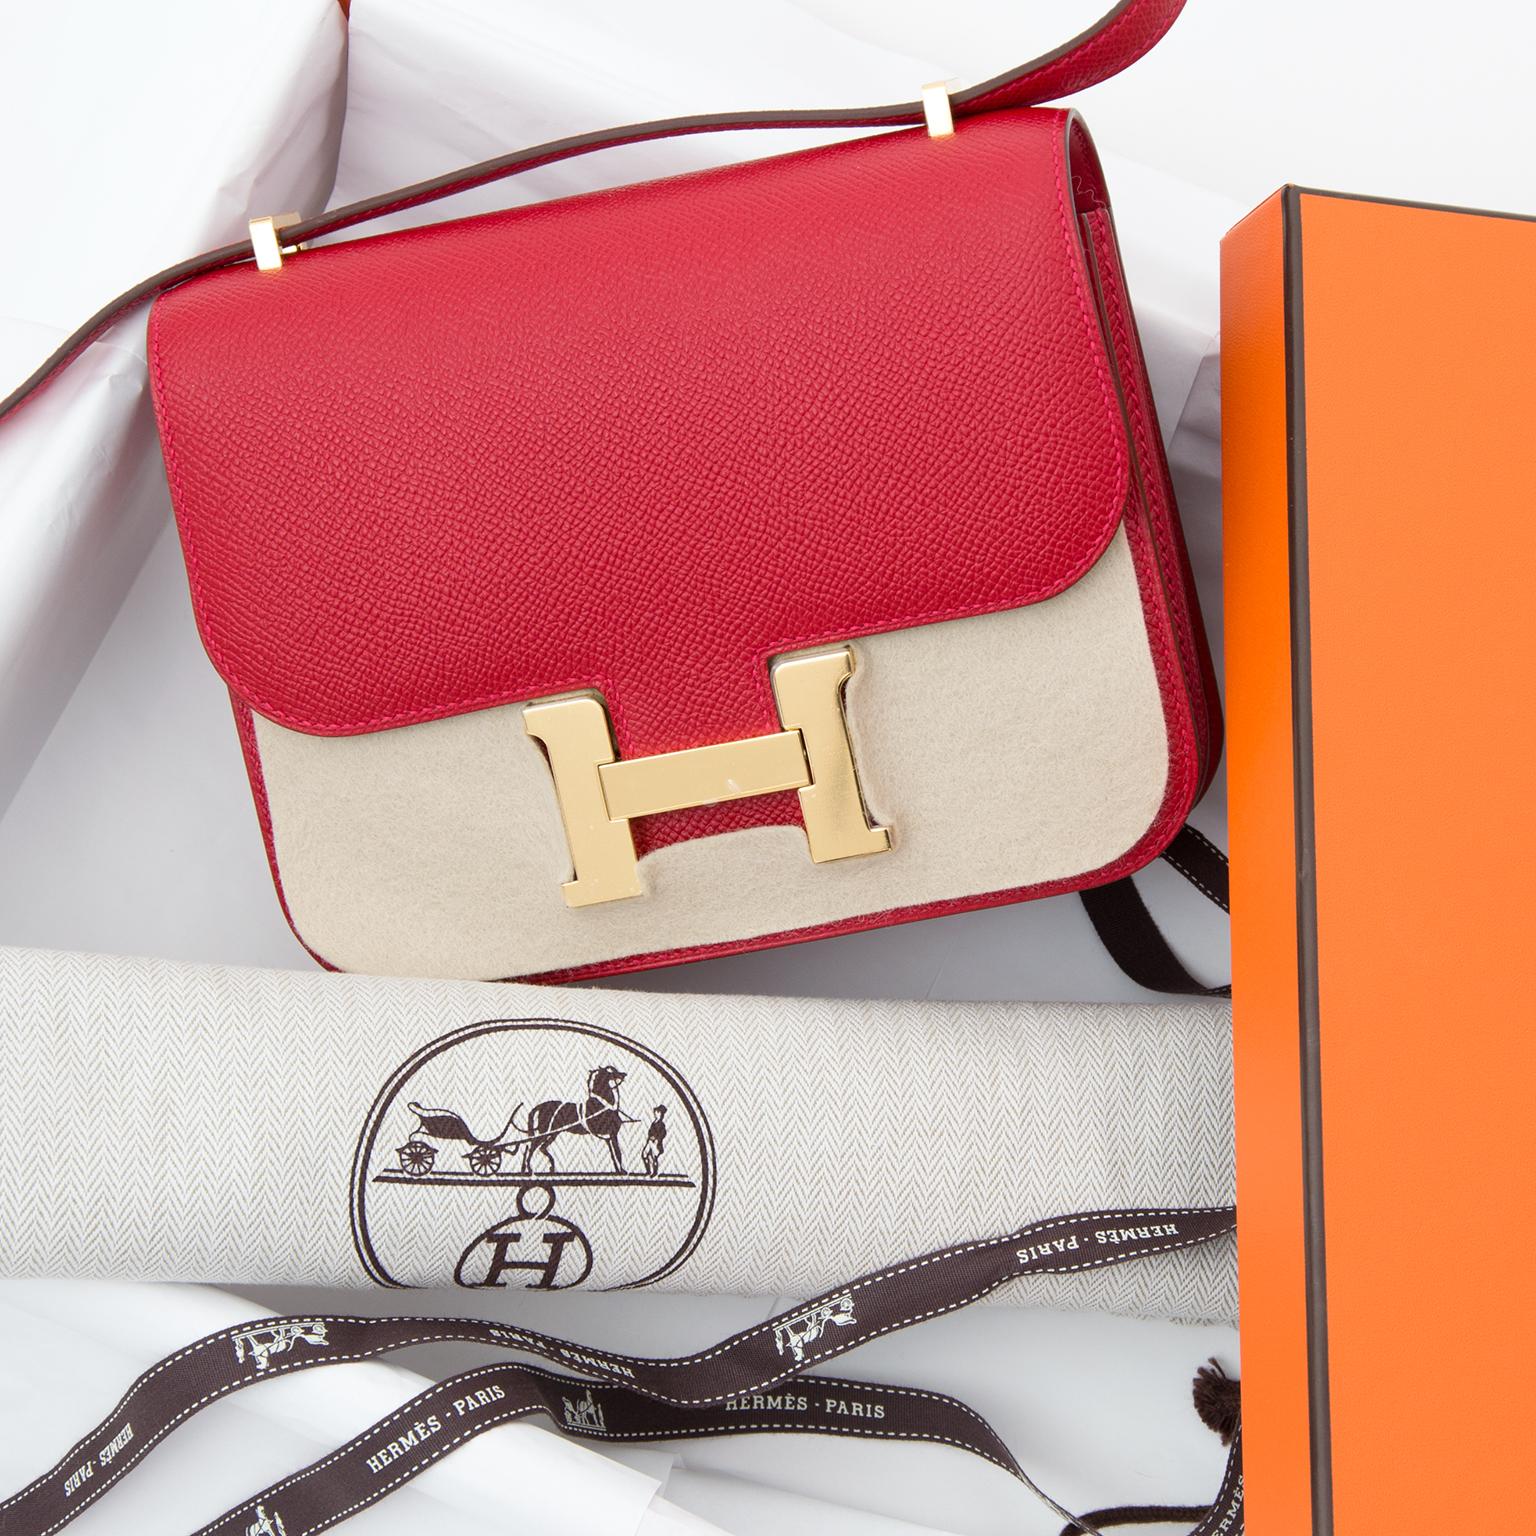 4229aebec1 ... new style brand new hermès mini constance iii veau epsom rouge casaque  acheter en ligne seconde